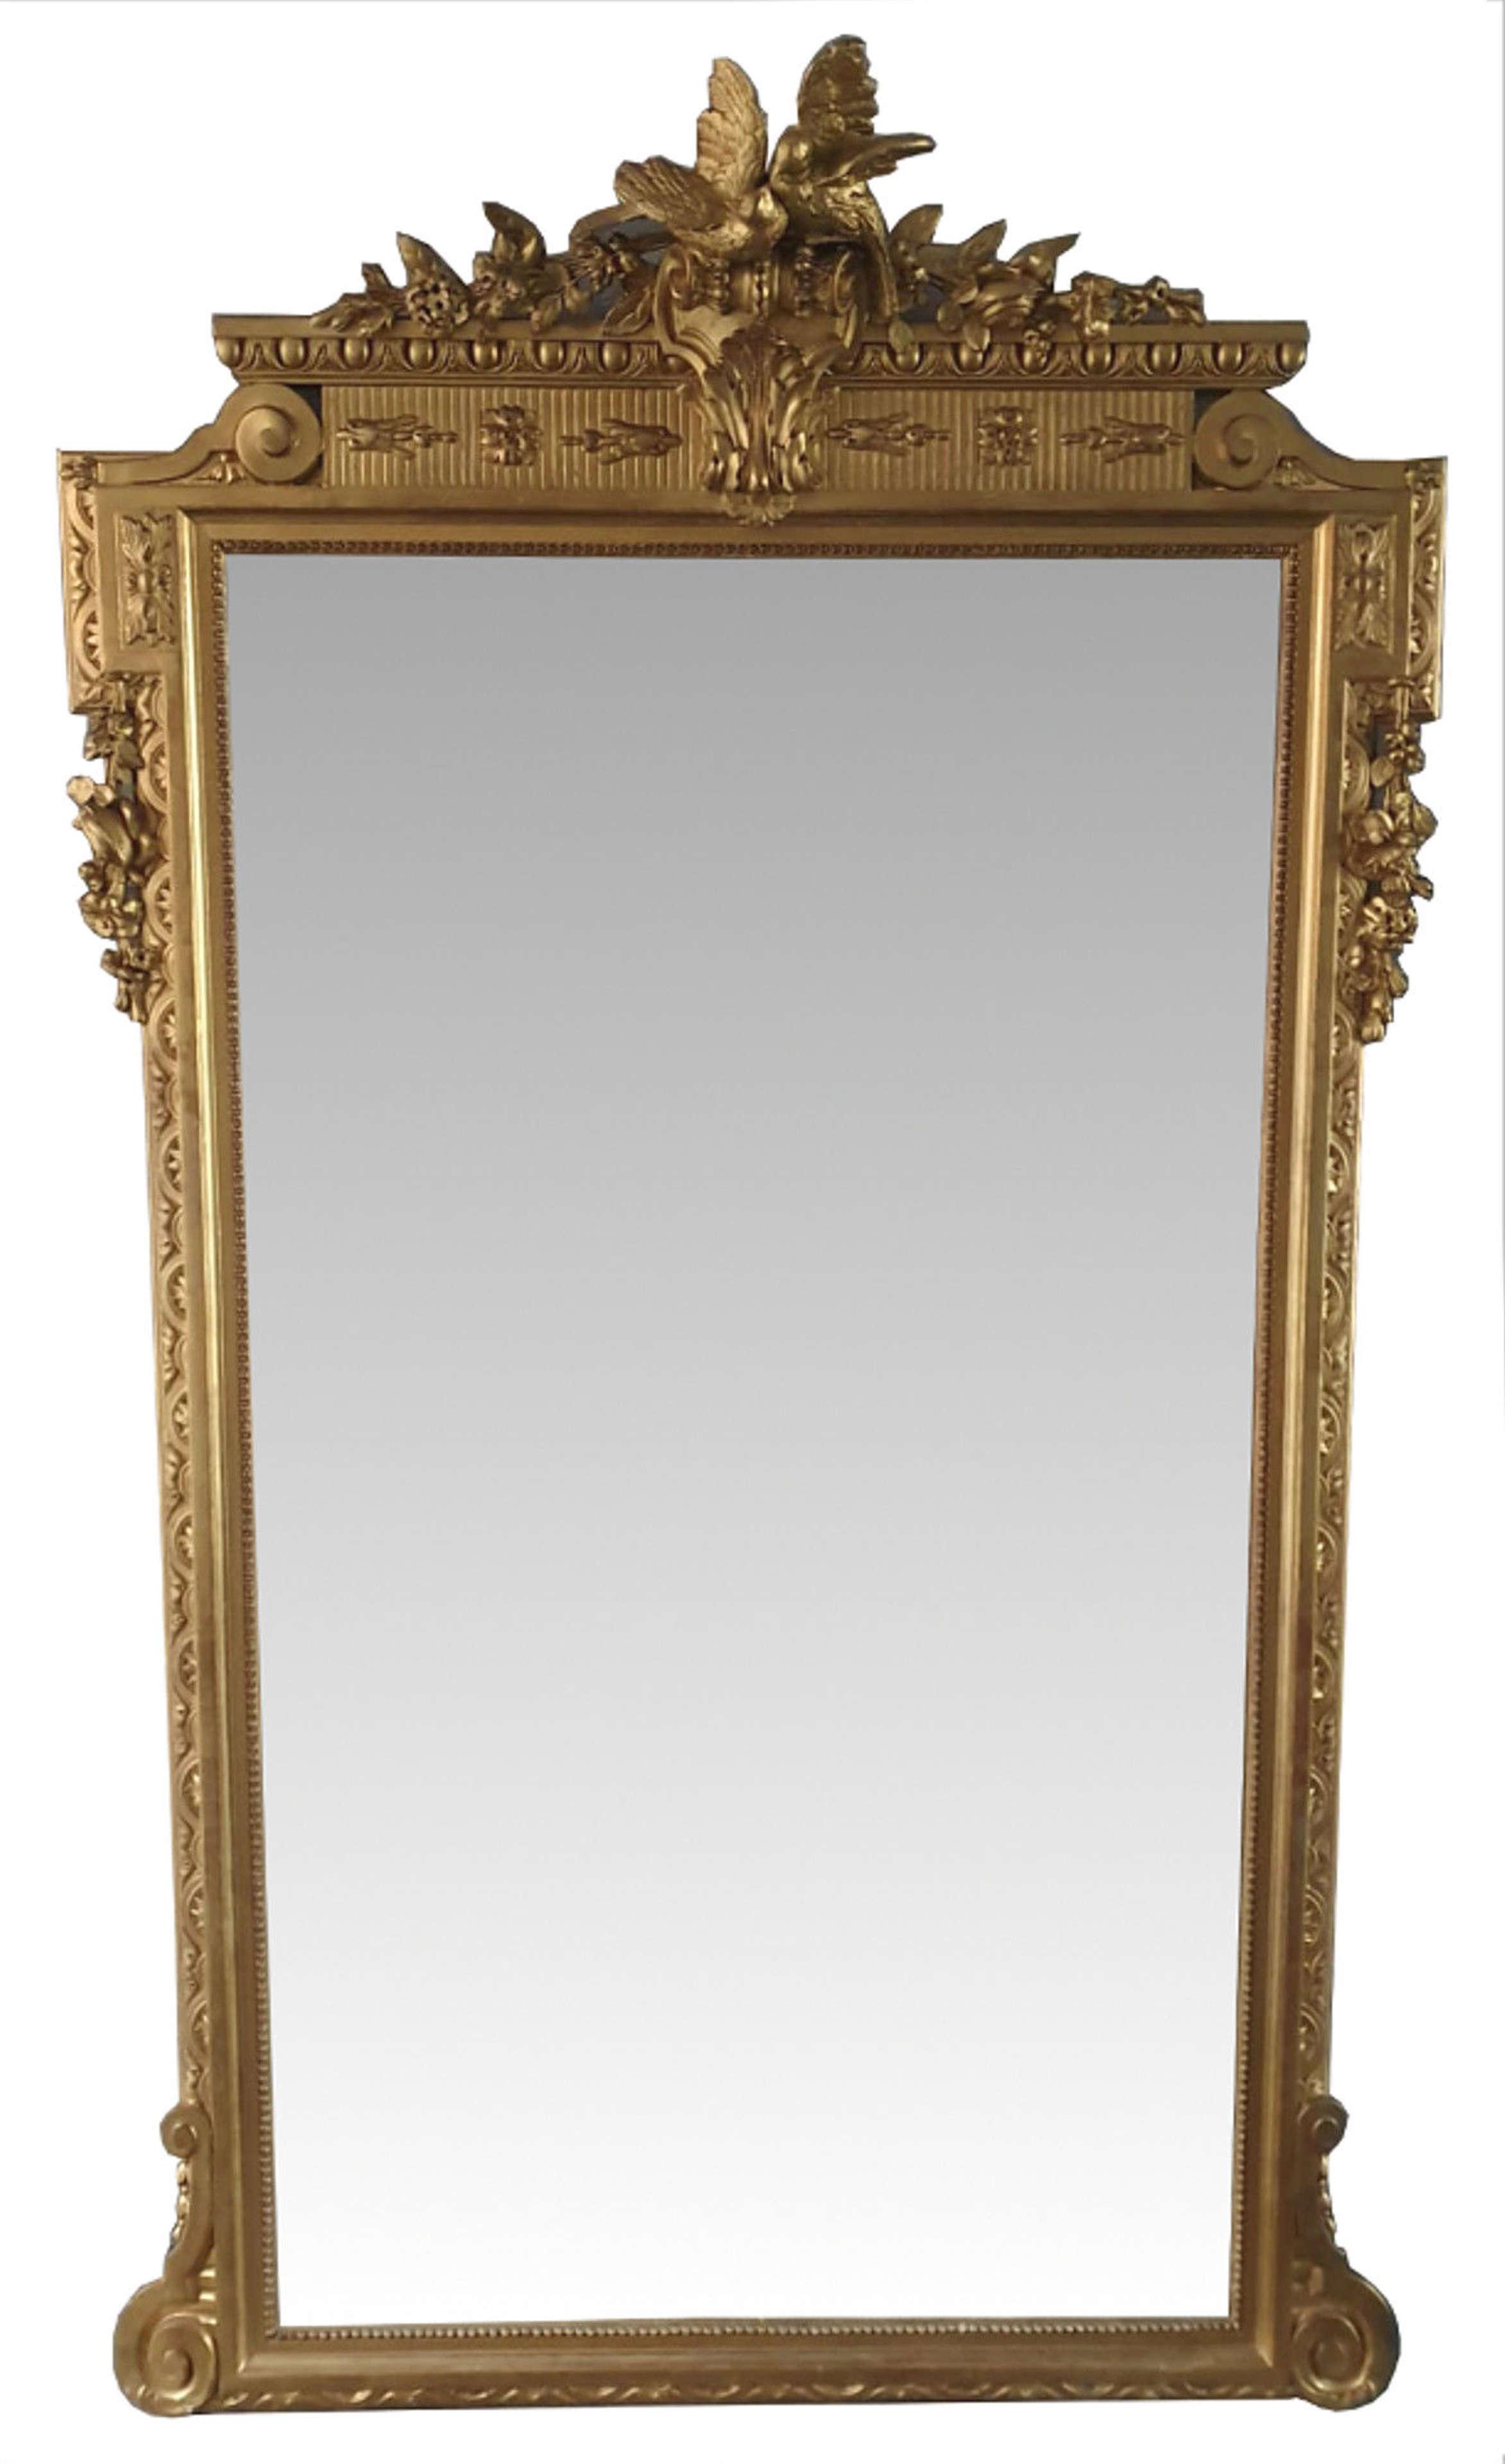 19th Century Gilt Dressing or Hall or Pier Mirror